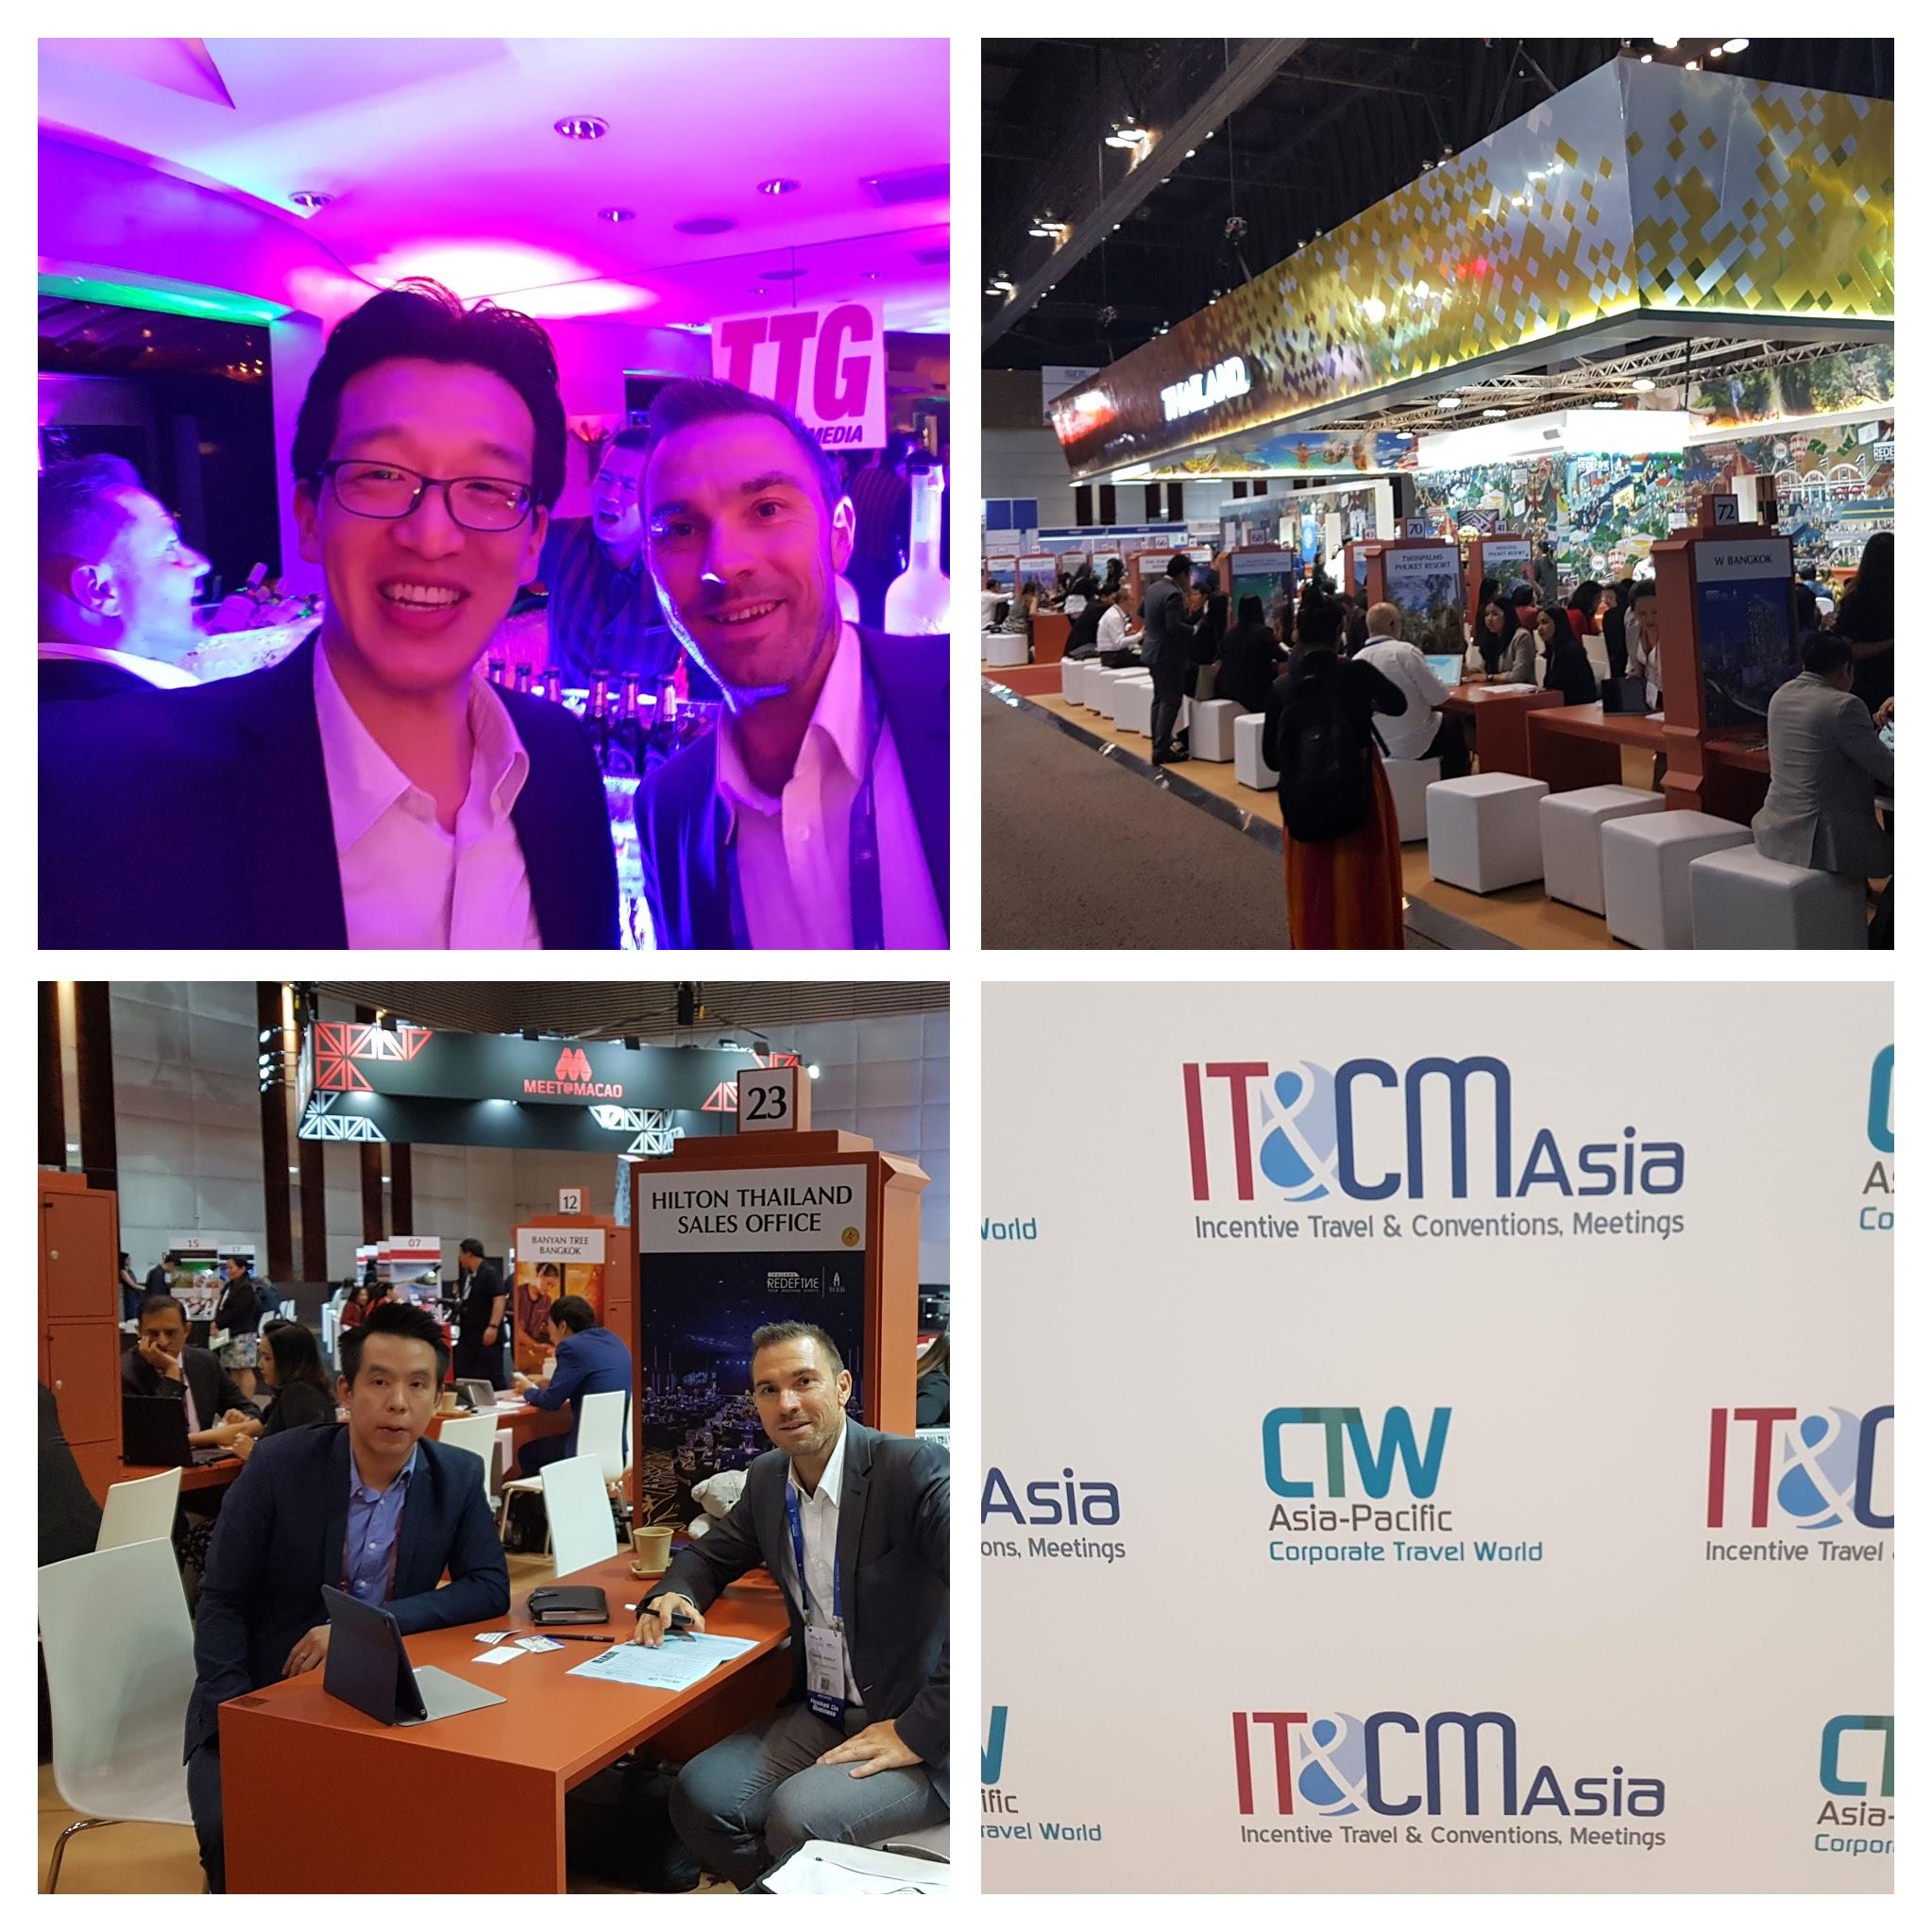 IT&CM Asia 2019 in Bangkok